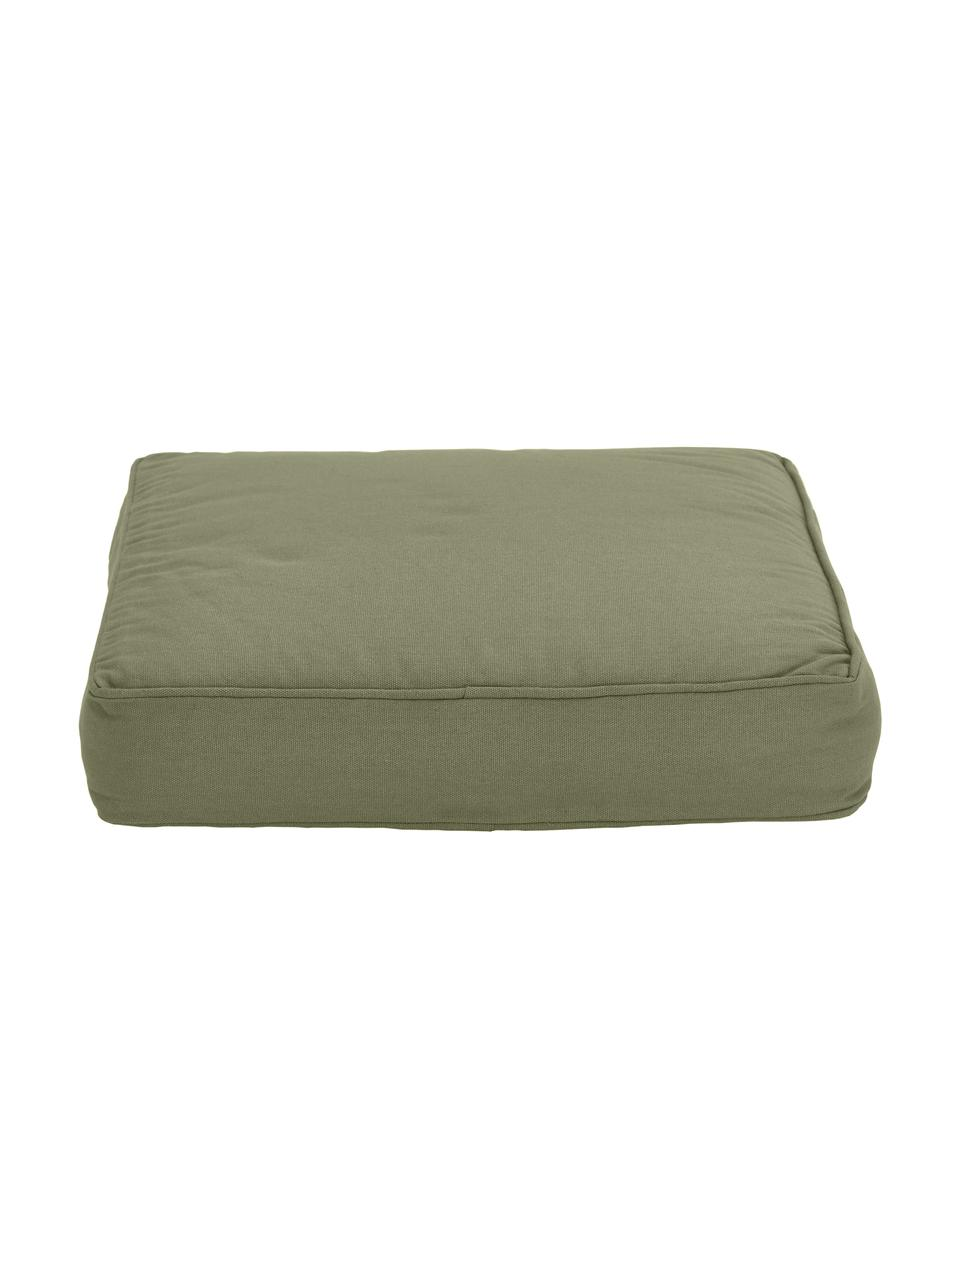 Cuscino sedia verde oliva Zoey, Rivestimento: 100% cotone, Verde, Larg. 40 x Lung. 40 cm